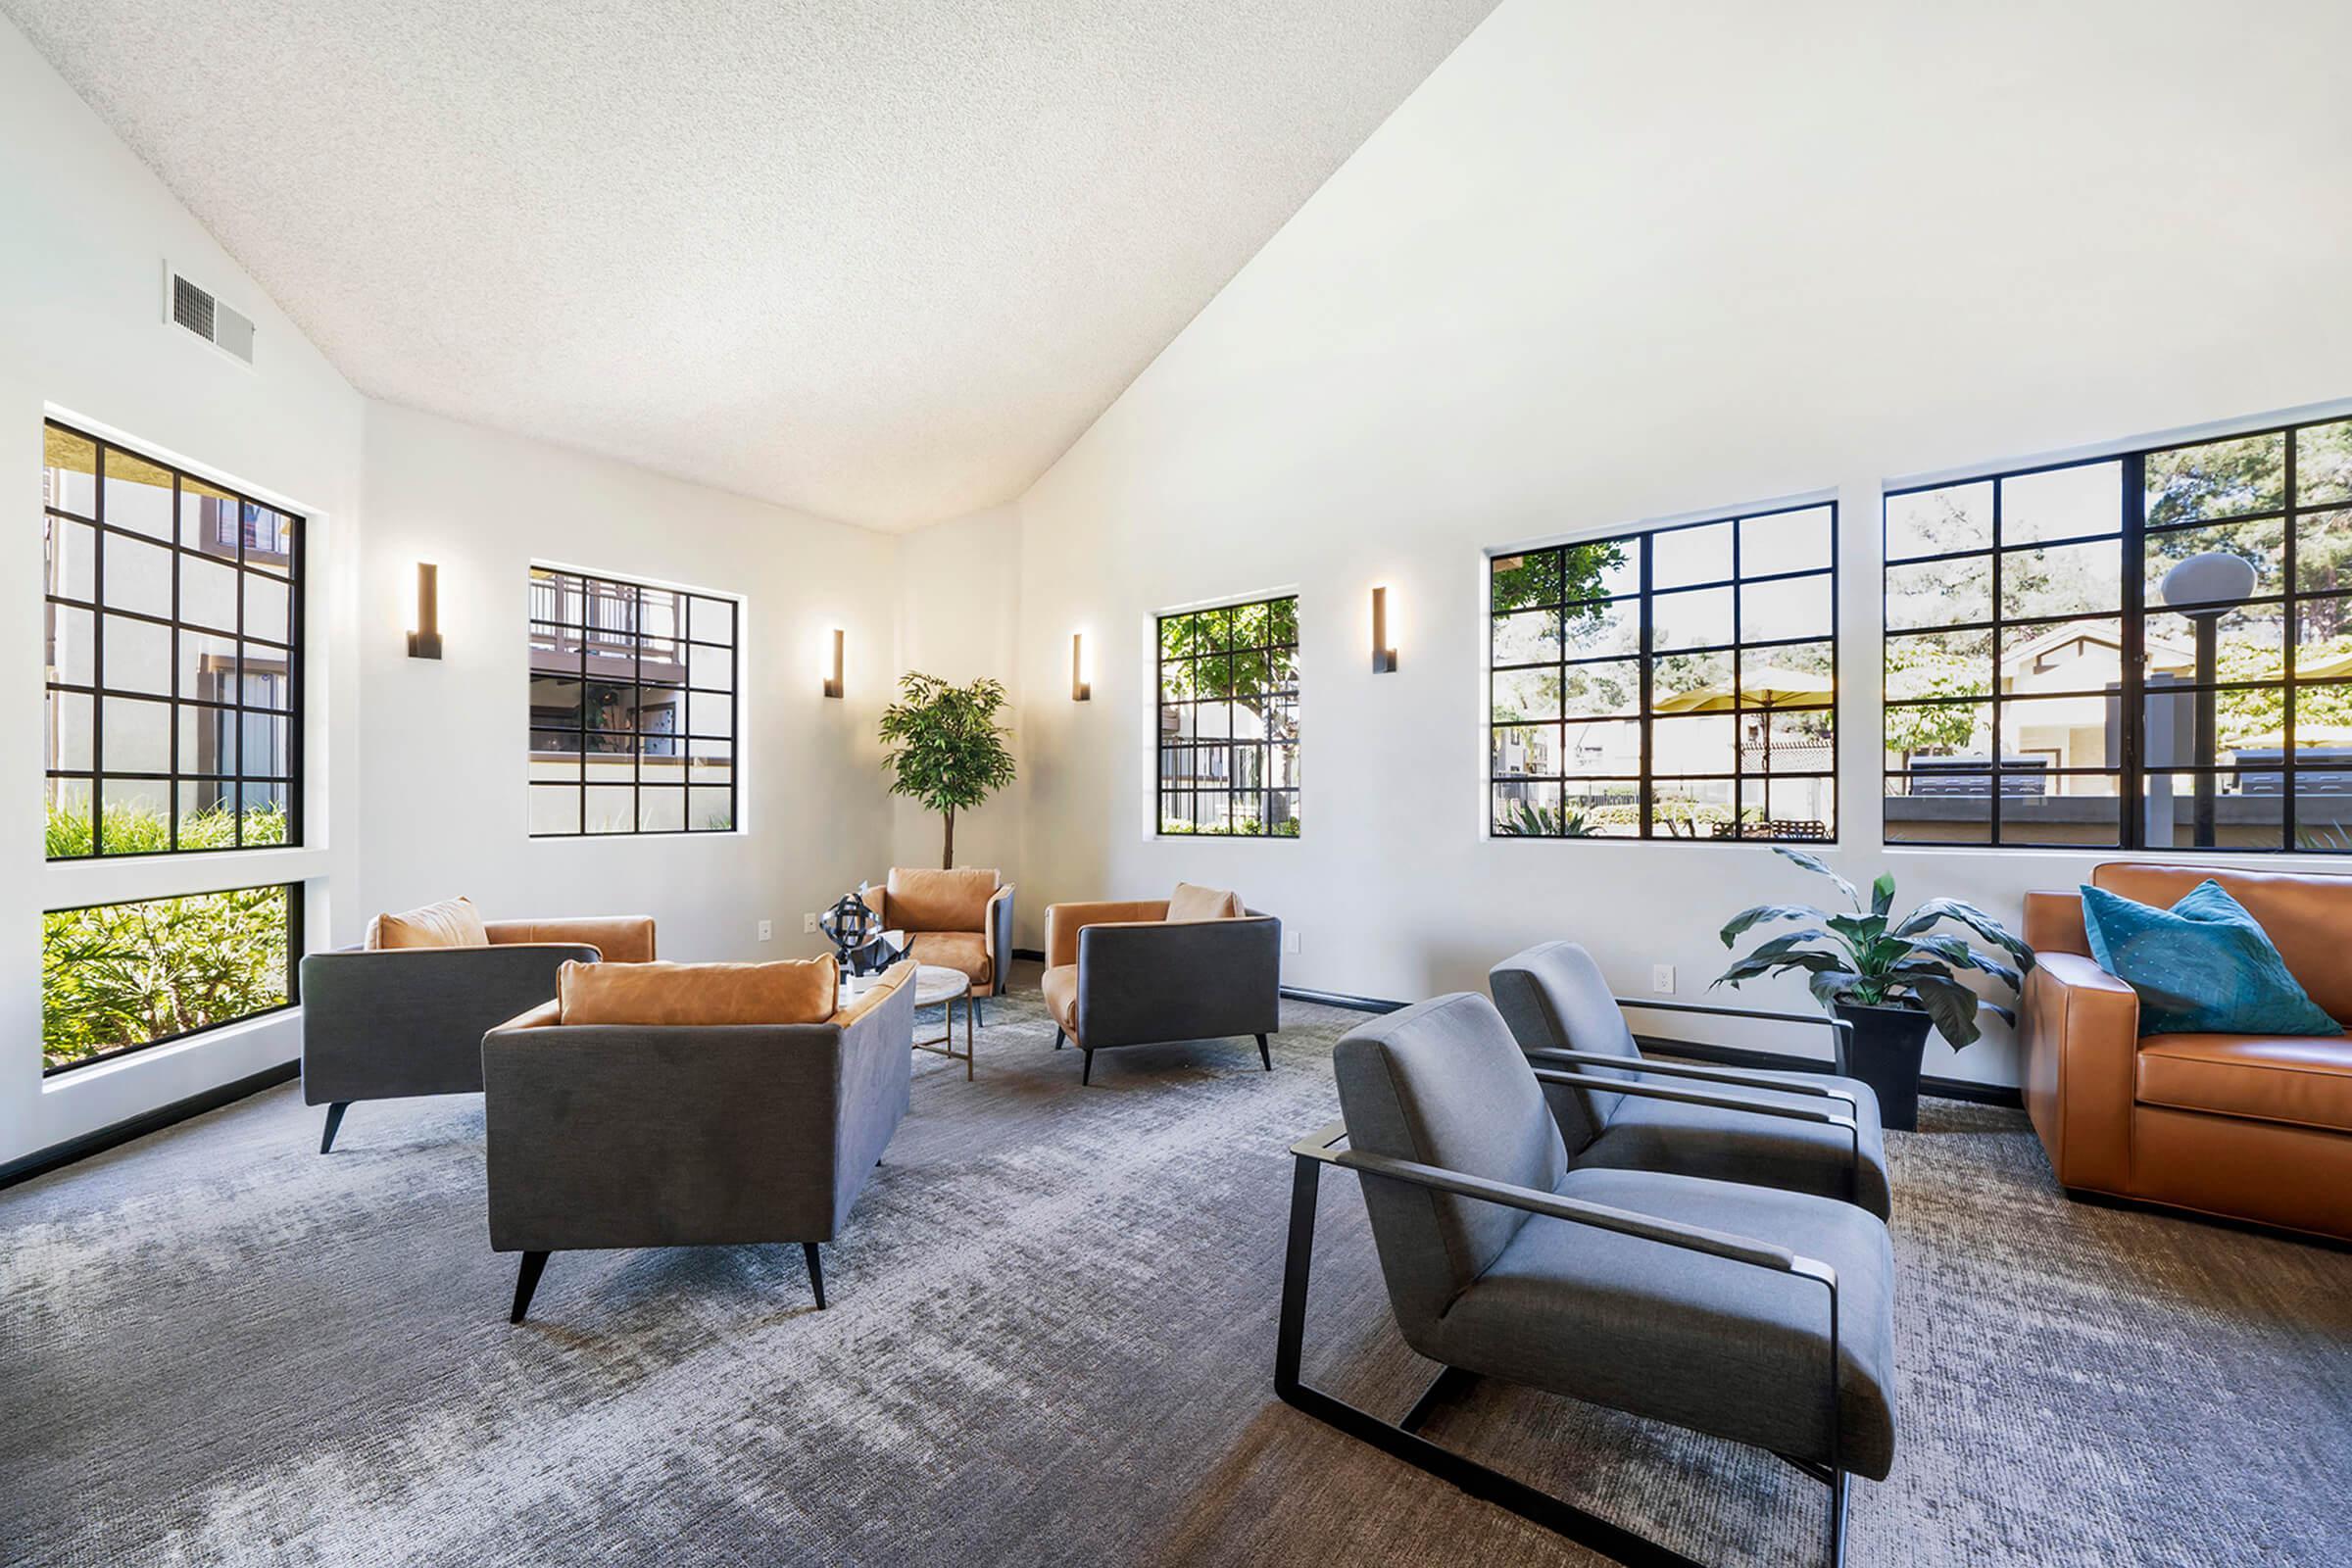 Villa La Paz Apartment Homes community room with chairs